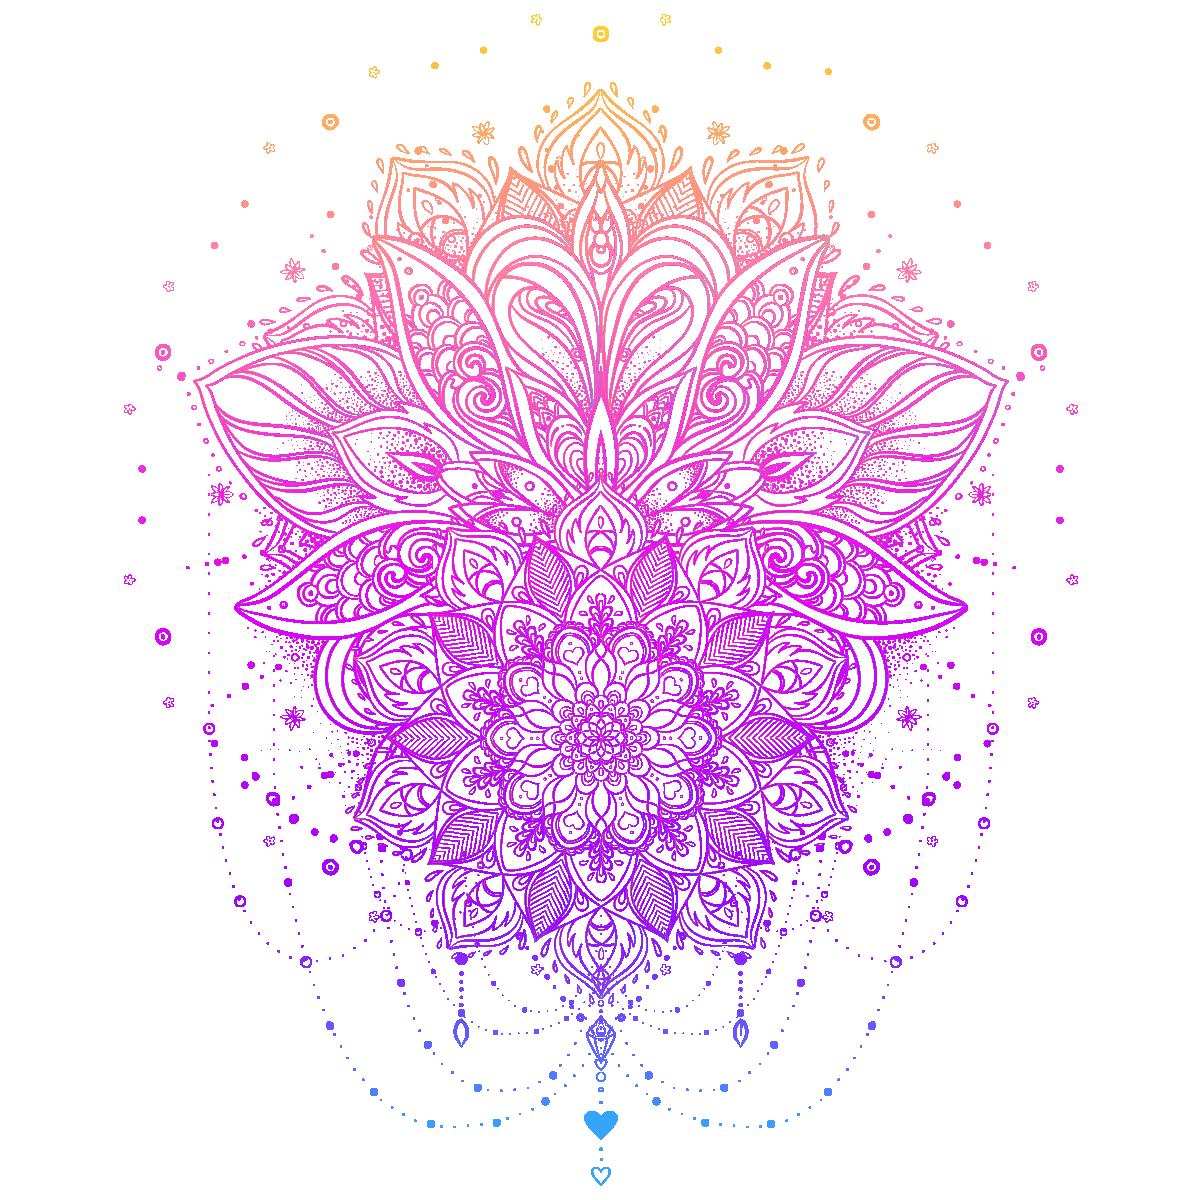 Sticker Boheme Fleur Mandala Stickers Nature Fleurs Ambiance Sticker